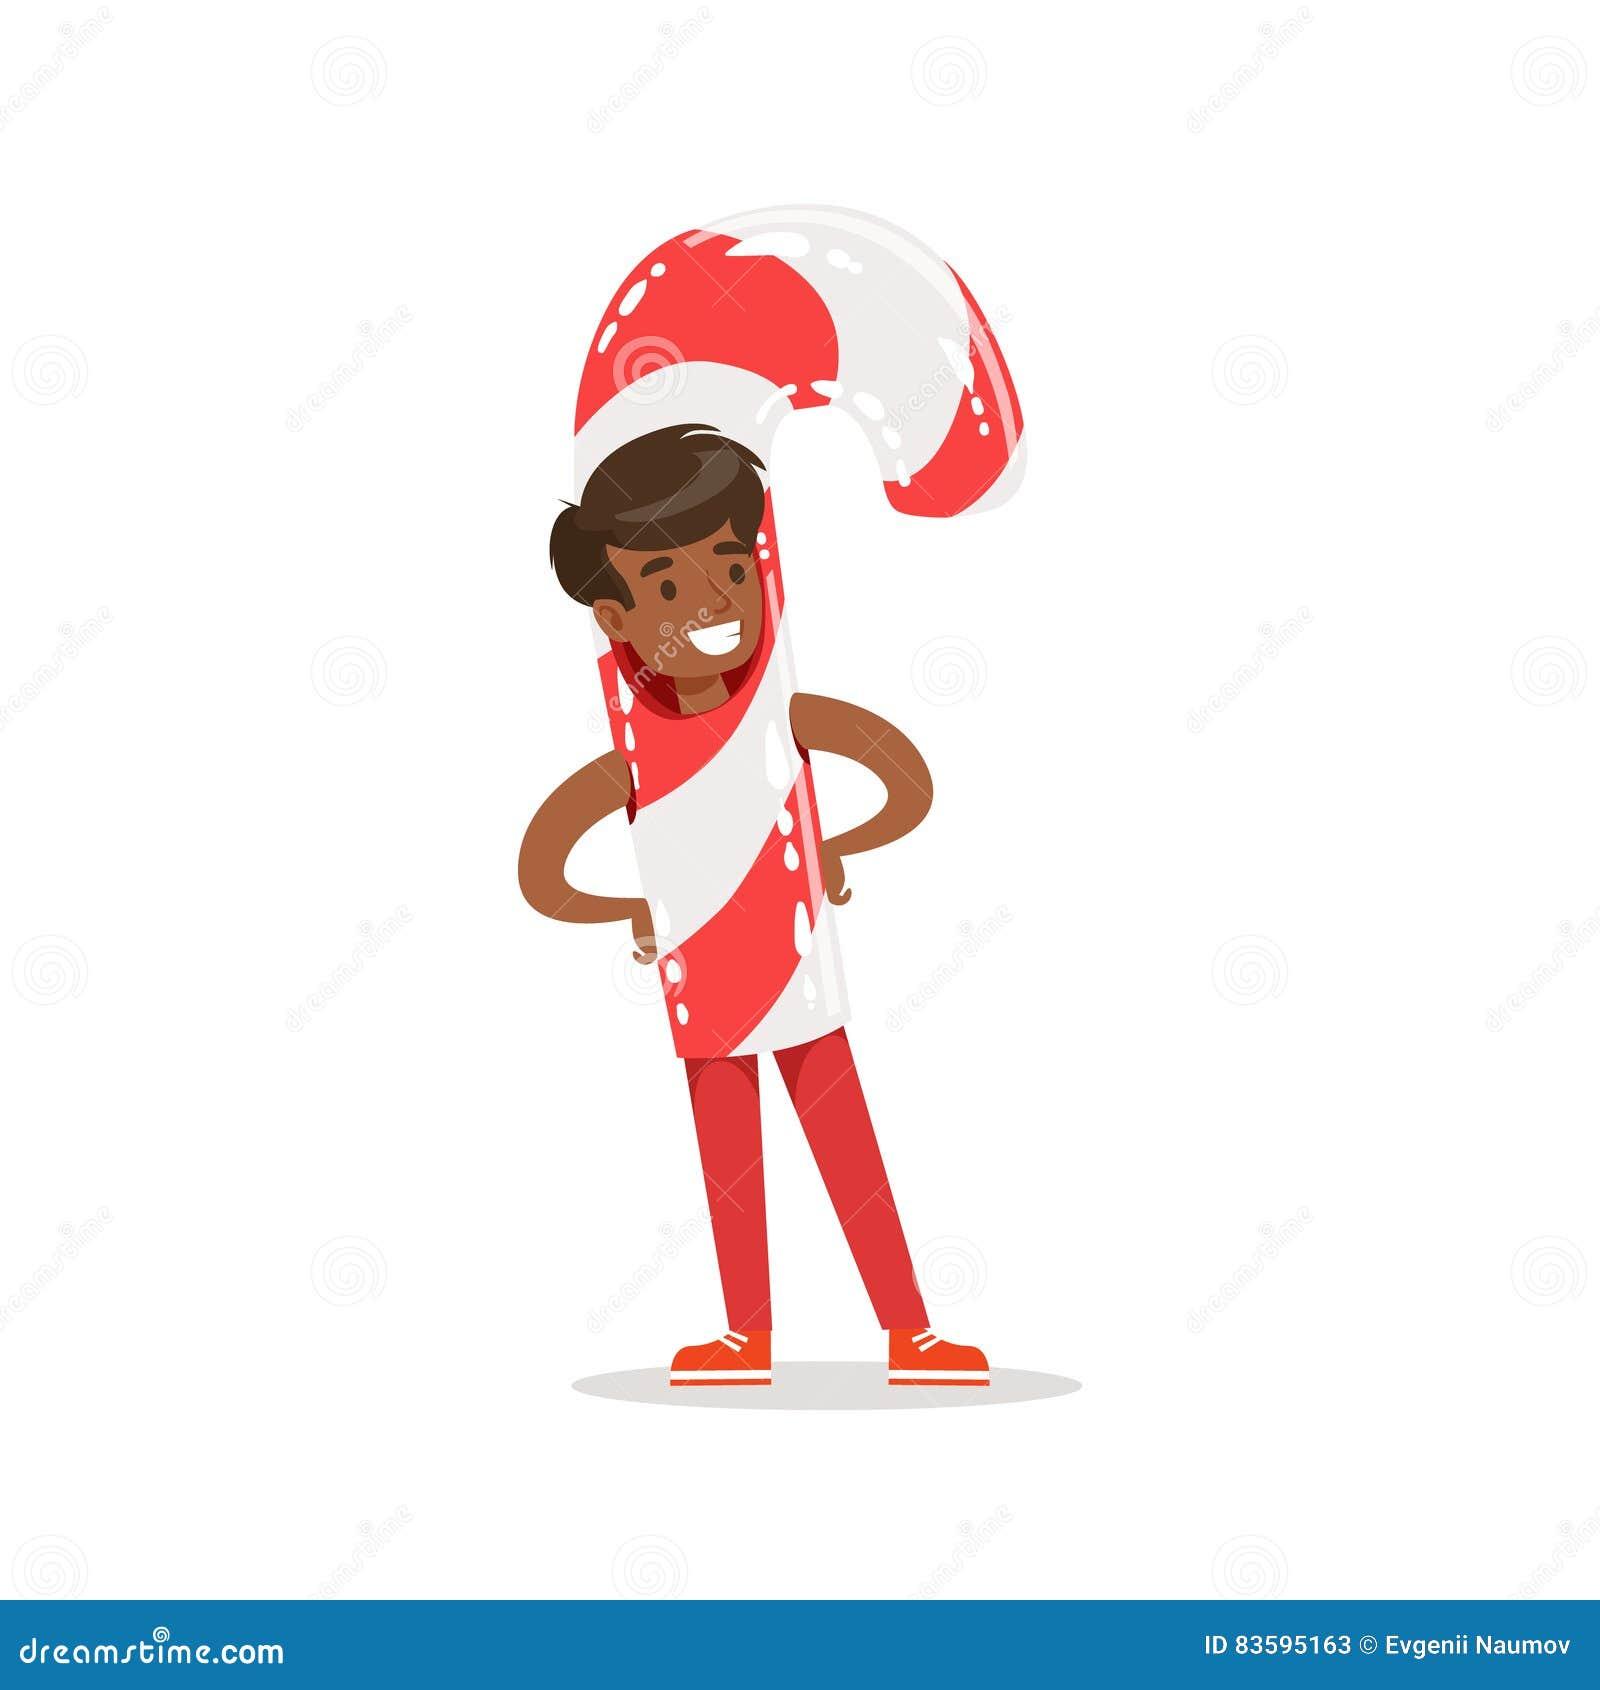 Junge Im Süßigkeits-Cane Stick Outfit Dressed As-Winterurlaub-Symbol ...